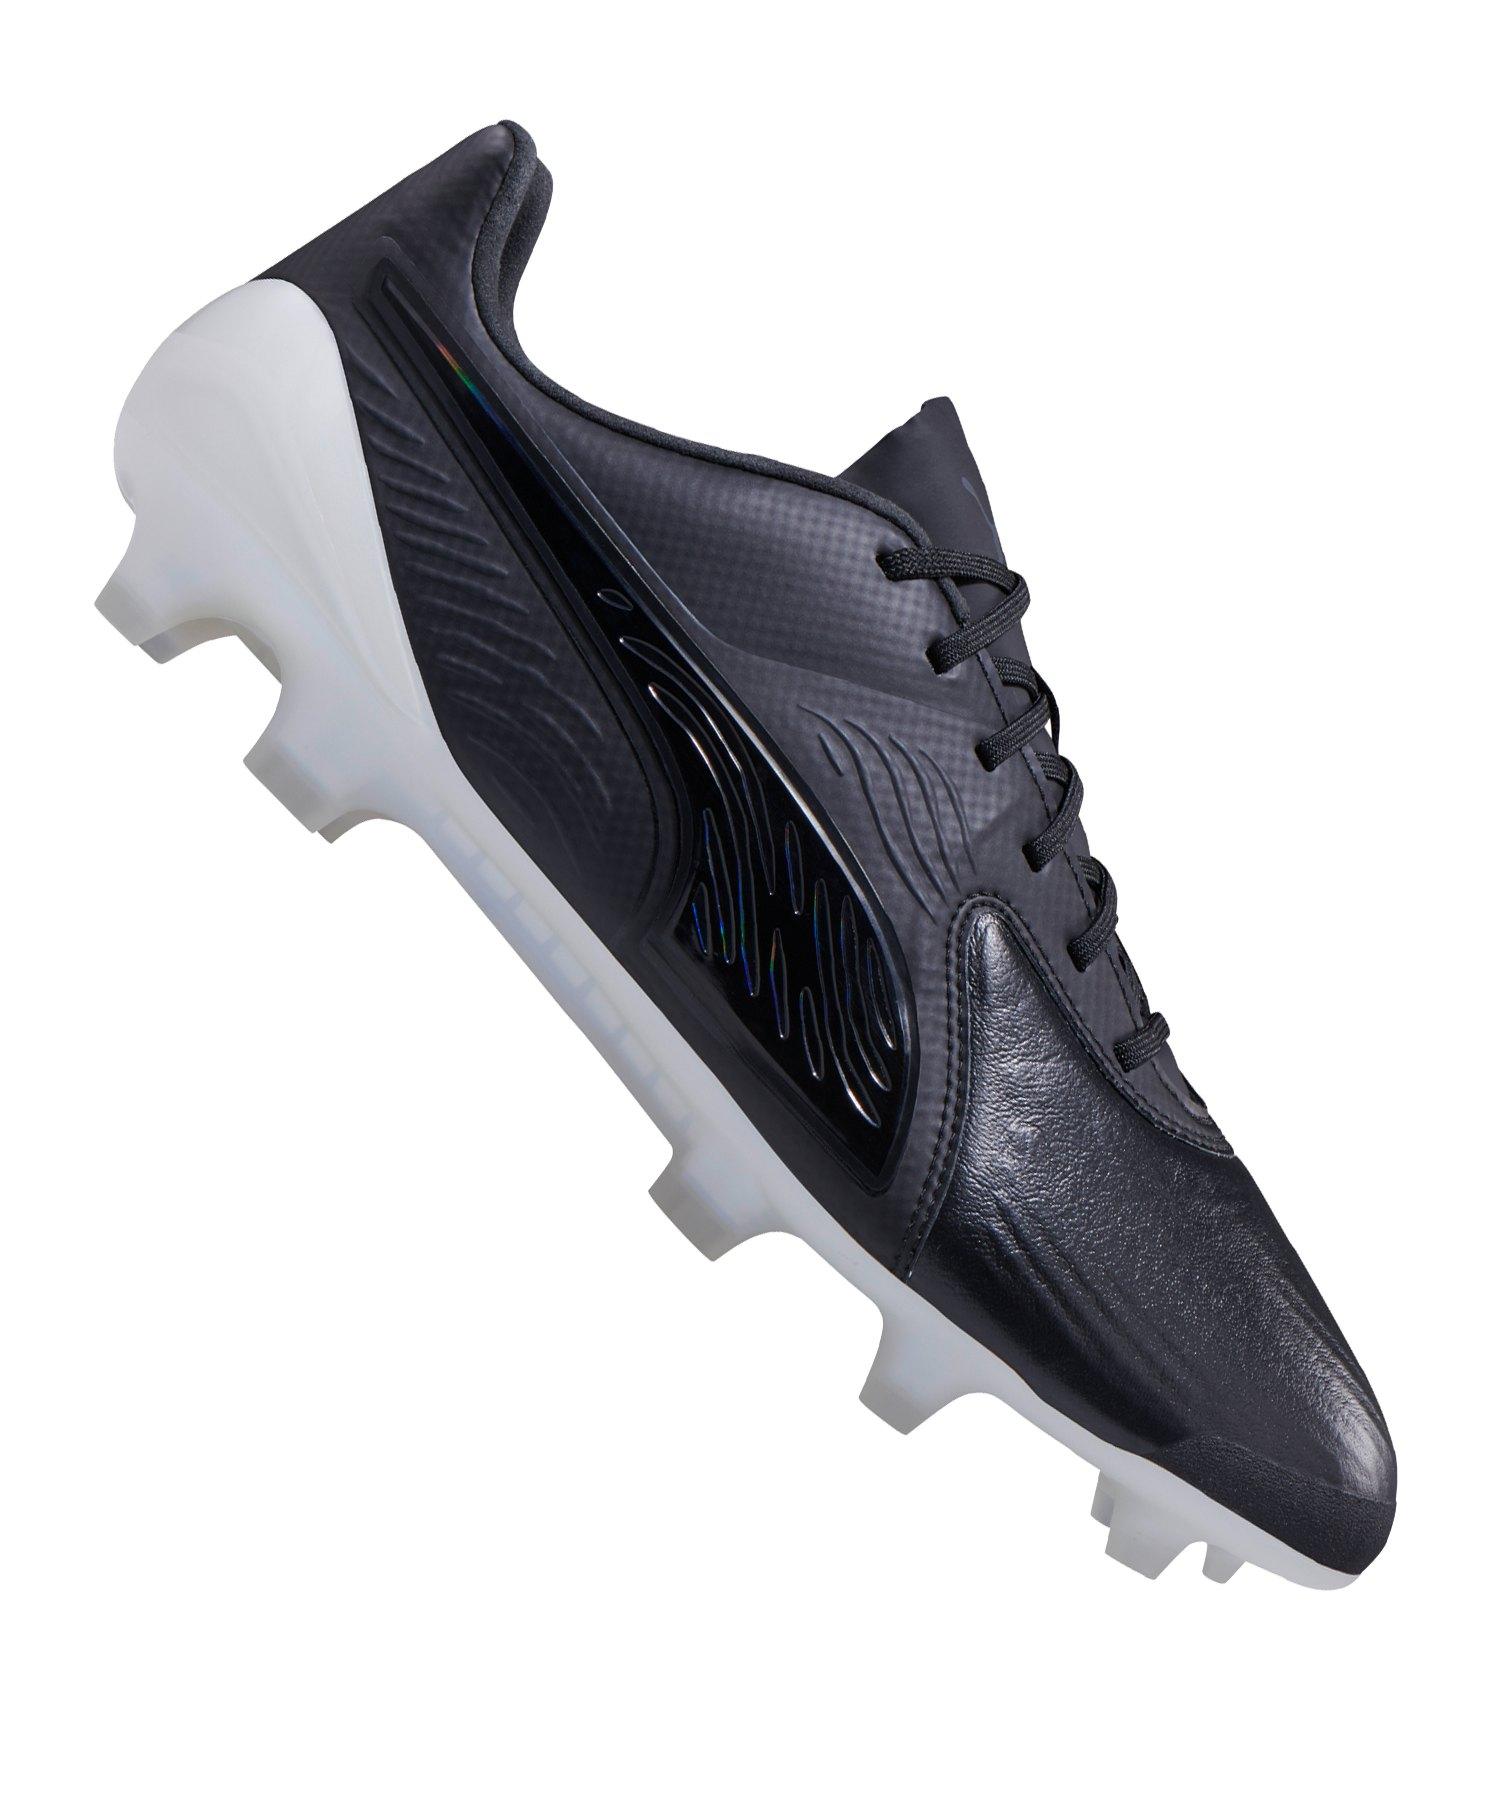 Puma One 19.1 CC FGAG Herren Fußballschuhe Nockenschuh blau rot schwarz